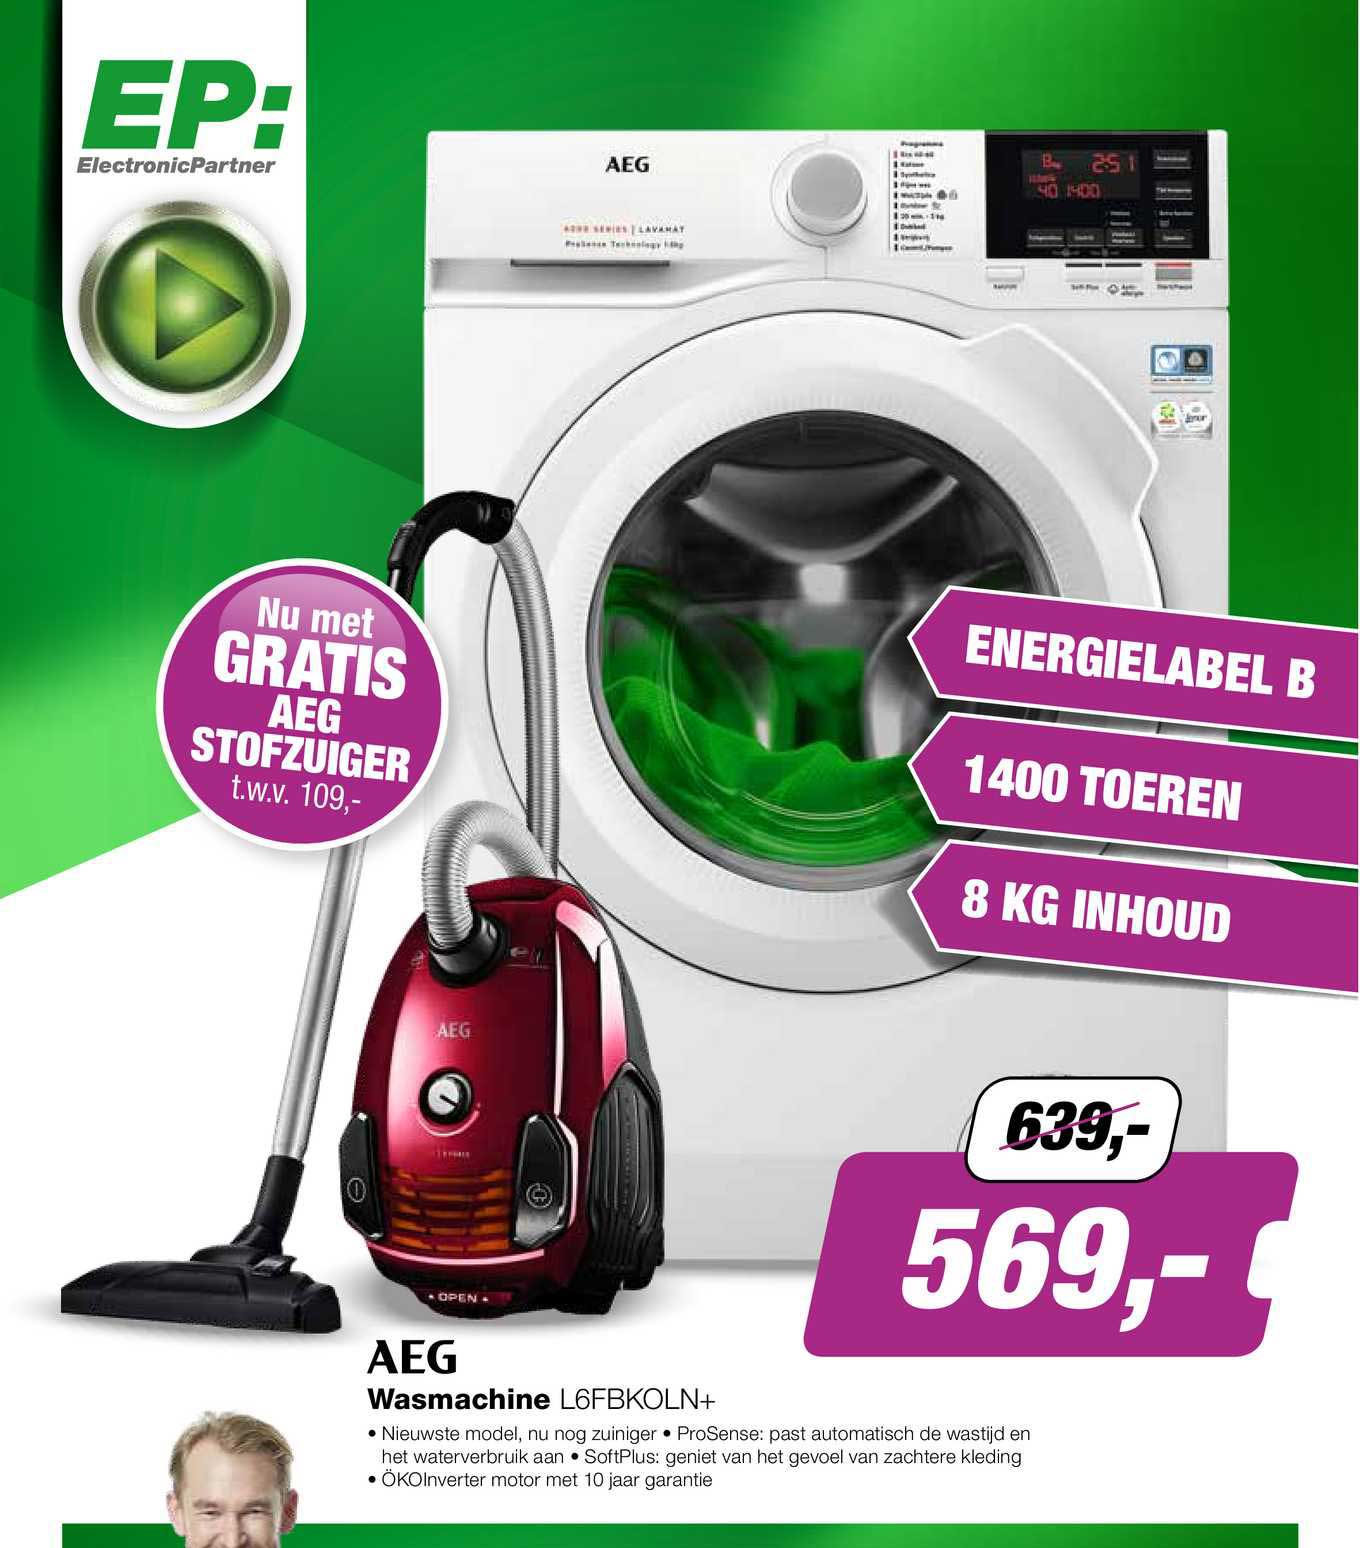 EP AEG Wasmachine L6FBKOLN+